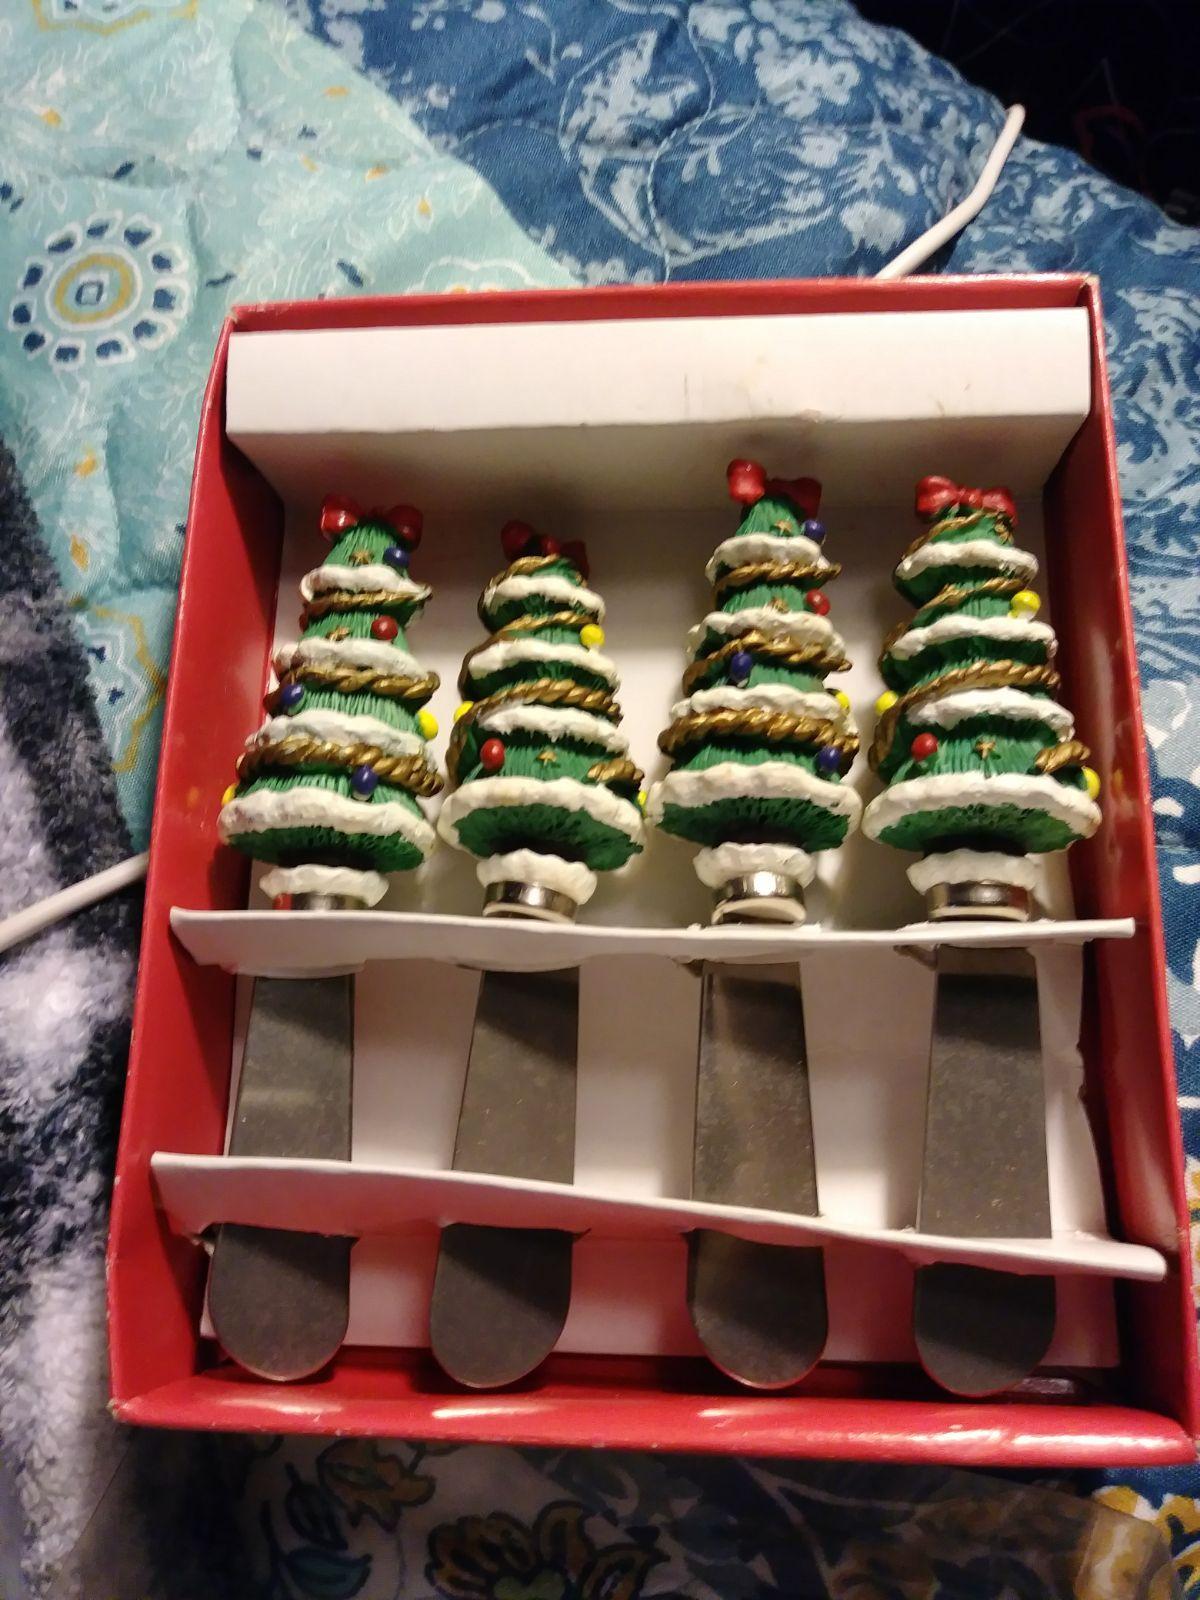 Vintage Christmas Decor Vintage Kitchen Utensils Christmas Hostess Gift Vintage Set of 4 Christmas Bulb Lights CheeseButter Spreaders